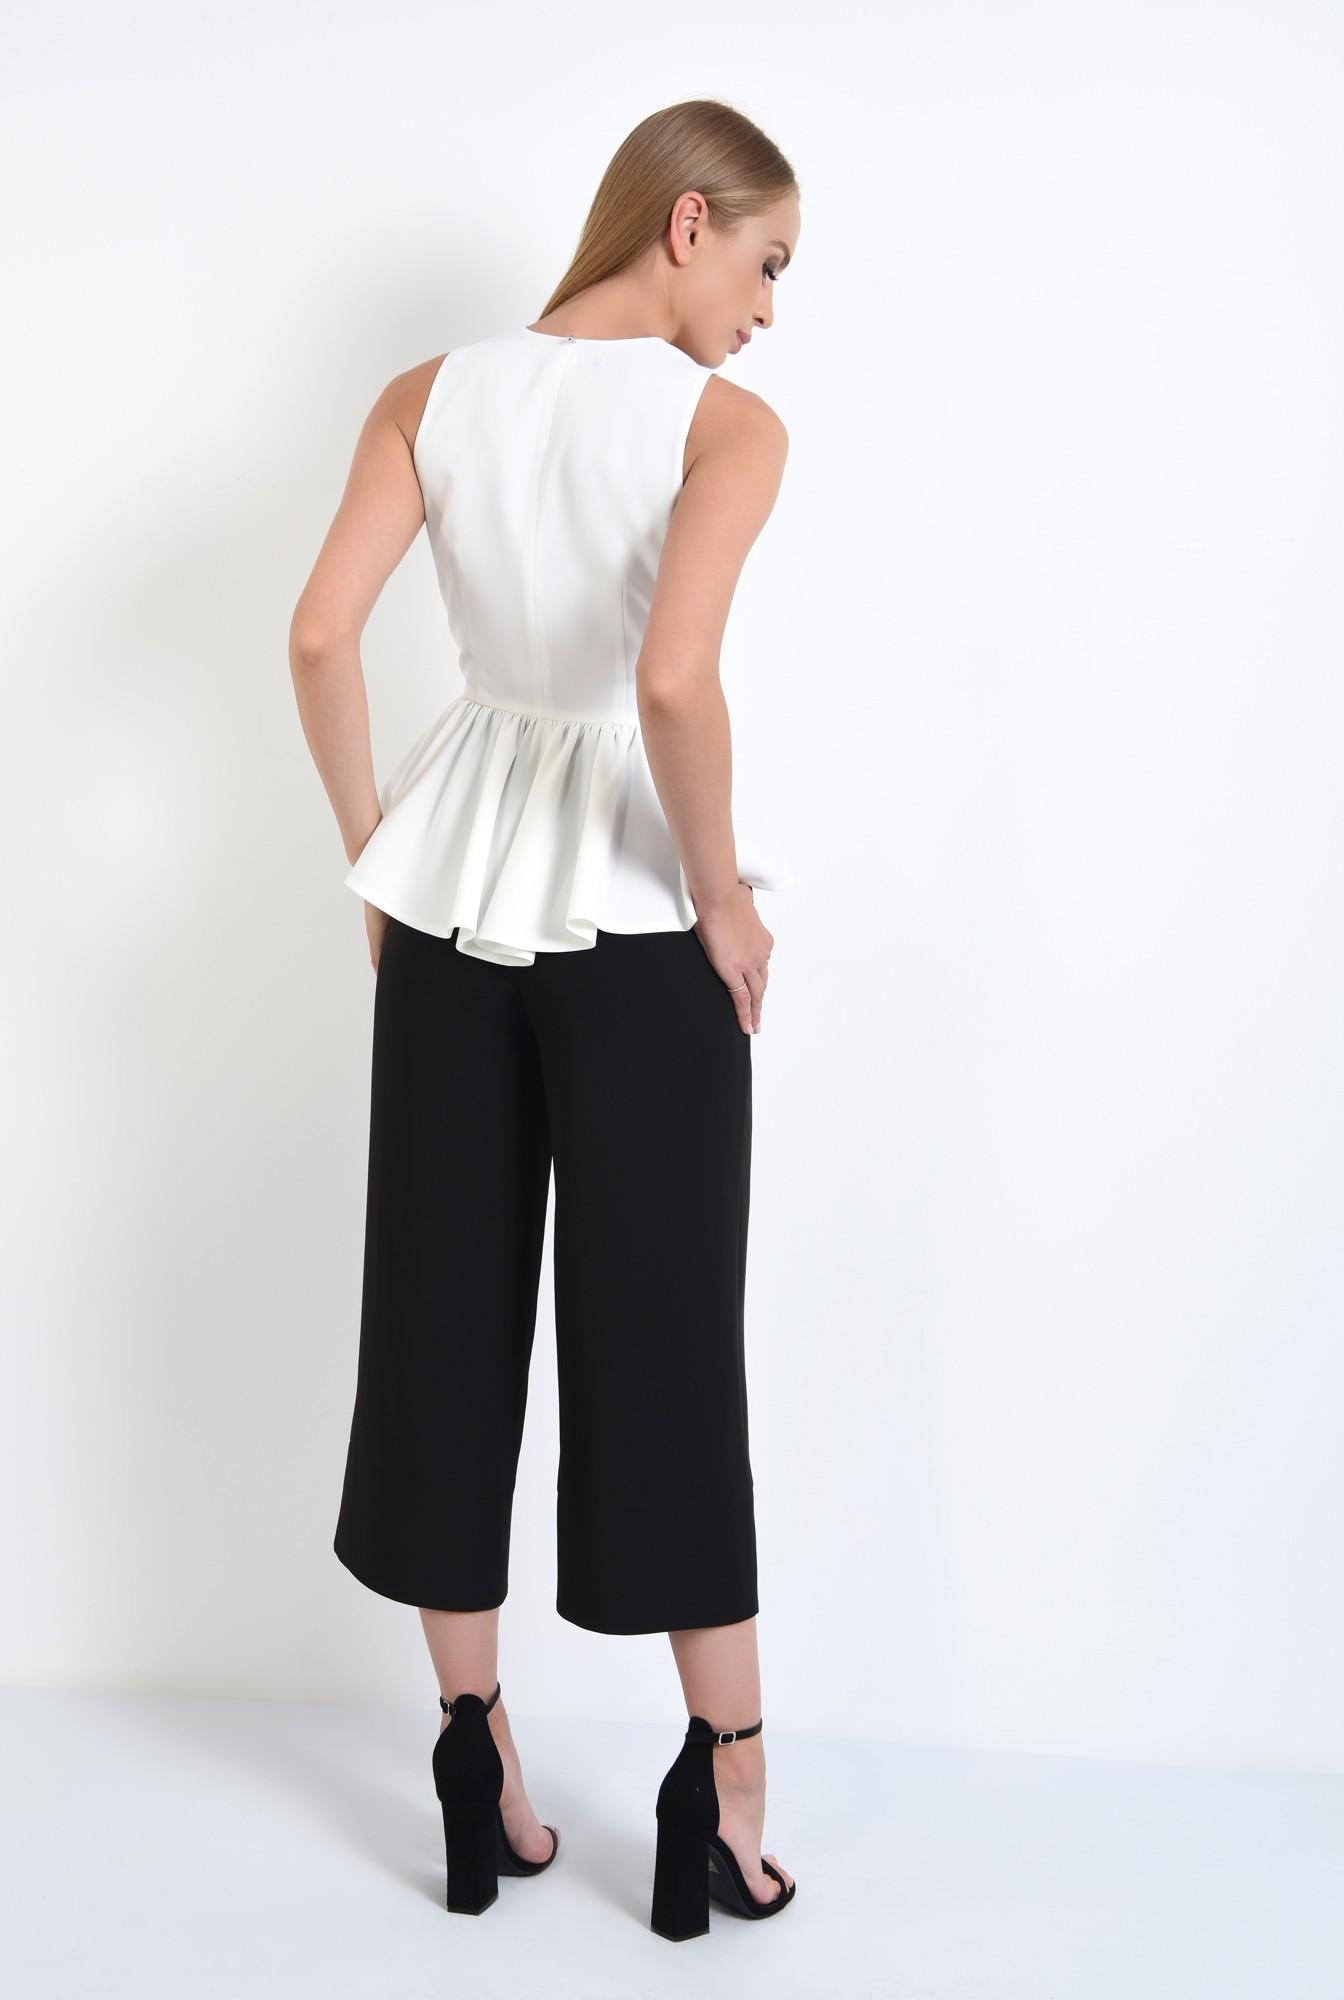 1 - 360 - pantaloni eleganti drepti, wide leg, buzunare functionale